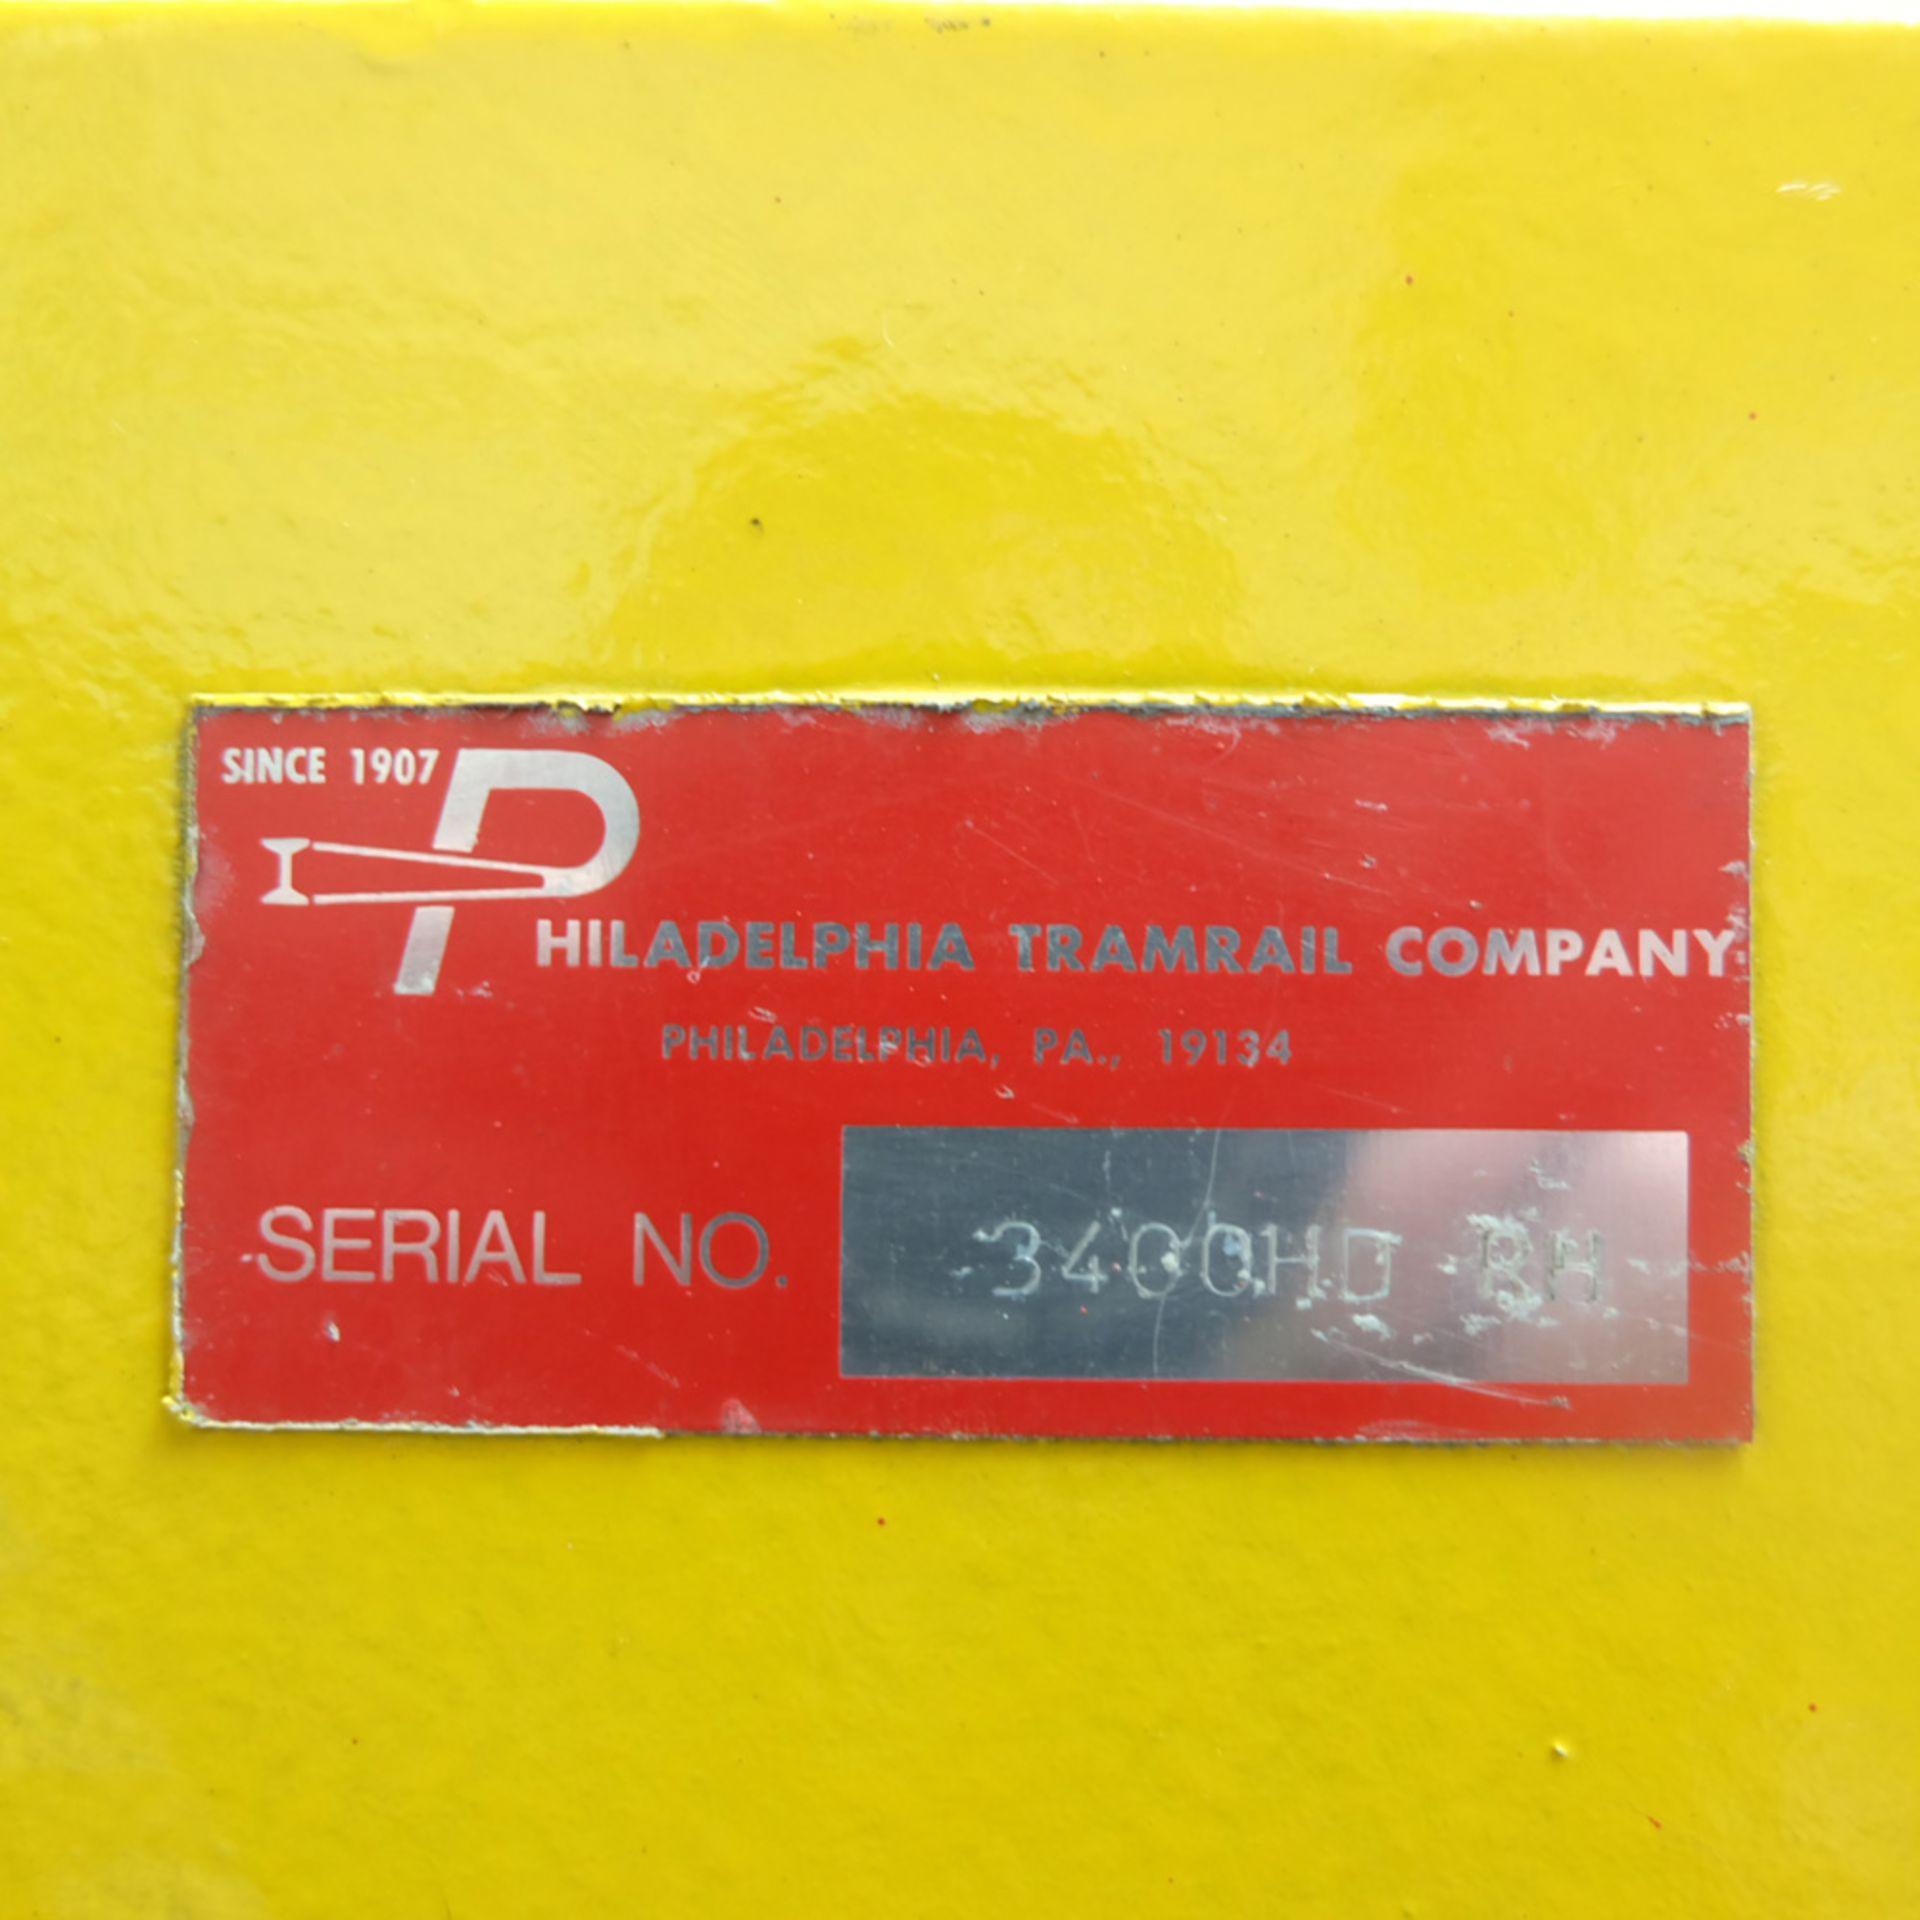 Philadelphia Tramrail Model 3400HD Vertical Downstroke Baler / Compactor. - Image 8 of 8